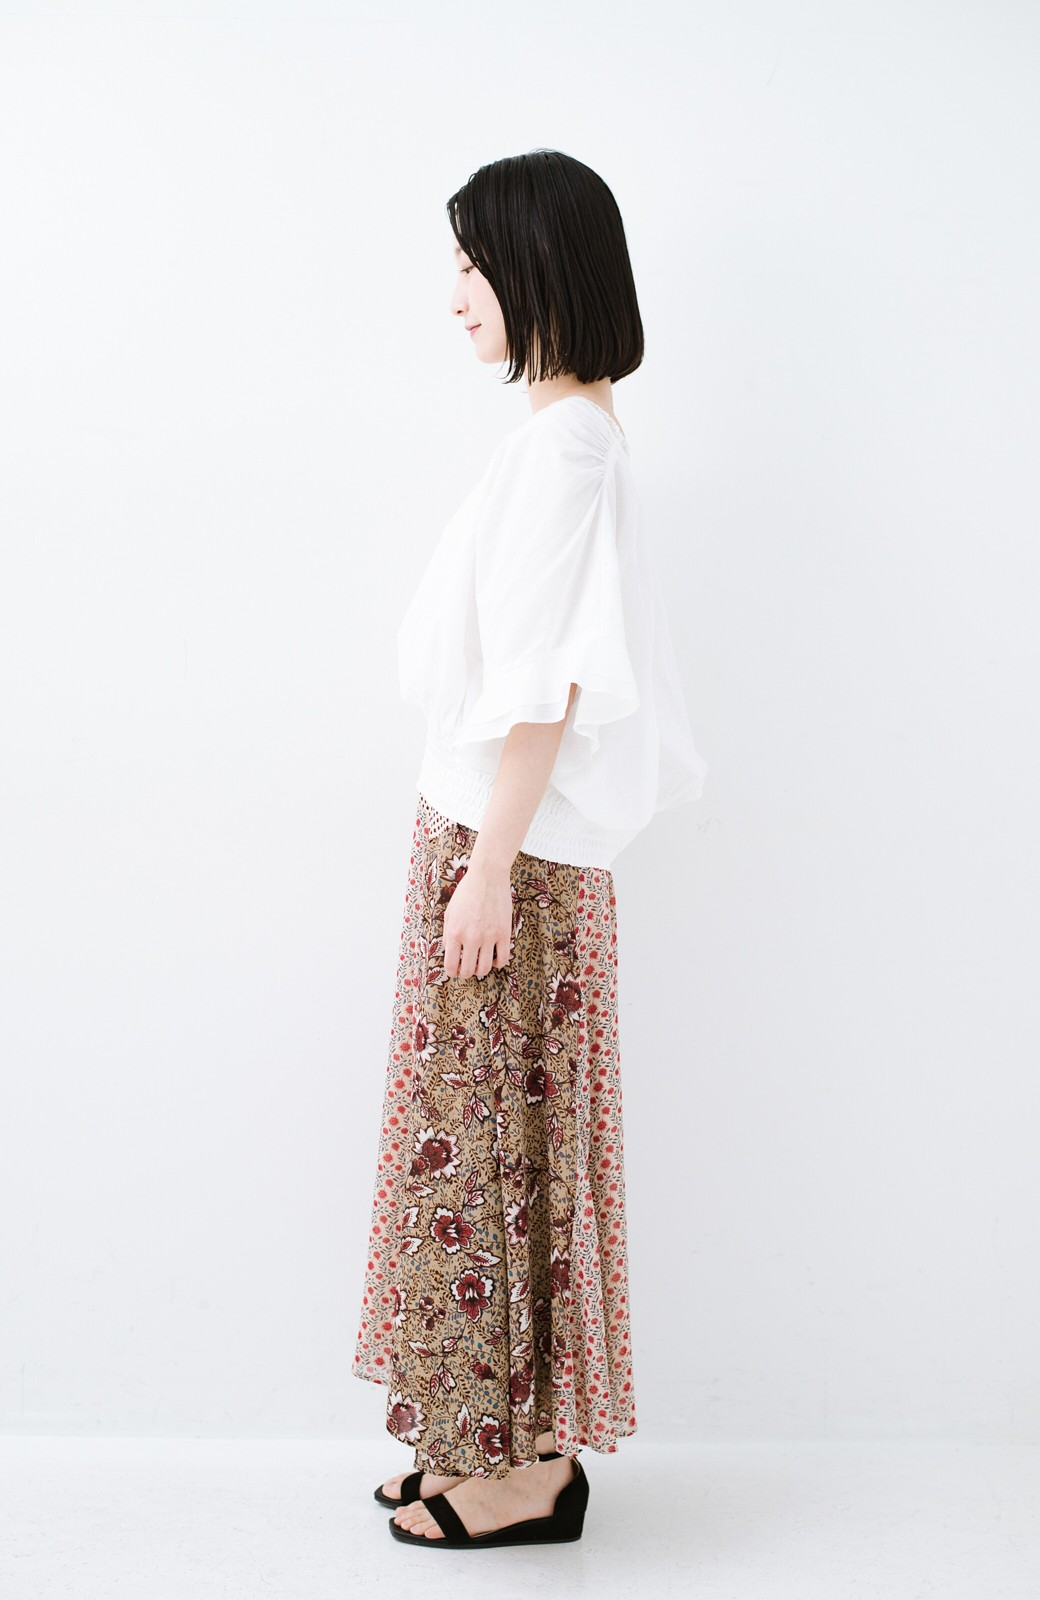 haco! 【洗濯機洗いOK】シンプルなトップスに合わせるだけでかわいくなれる MIX柄スカート <ベージュ系その他>の商品写真12